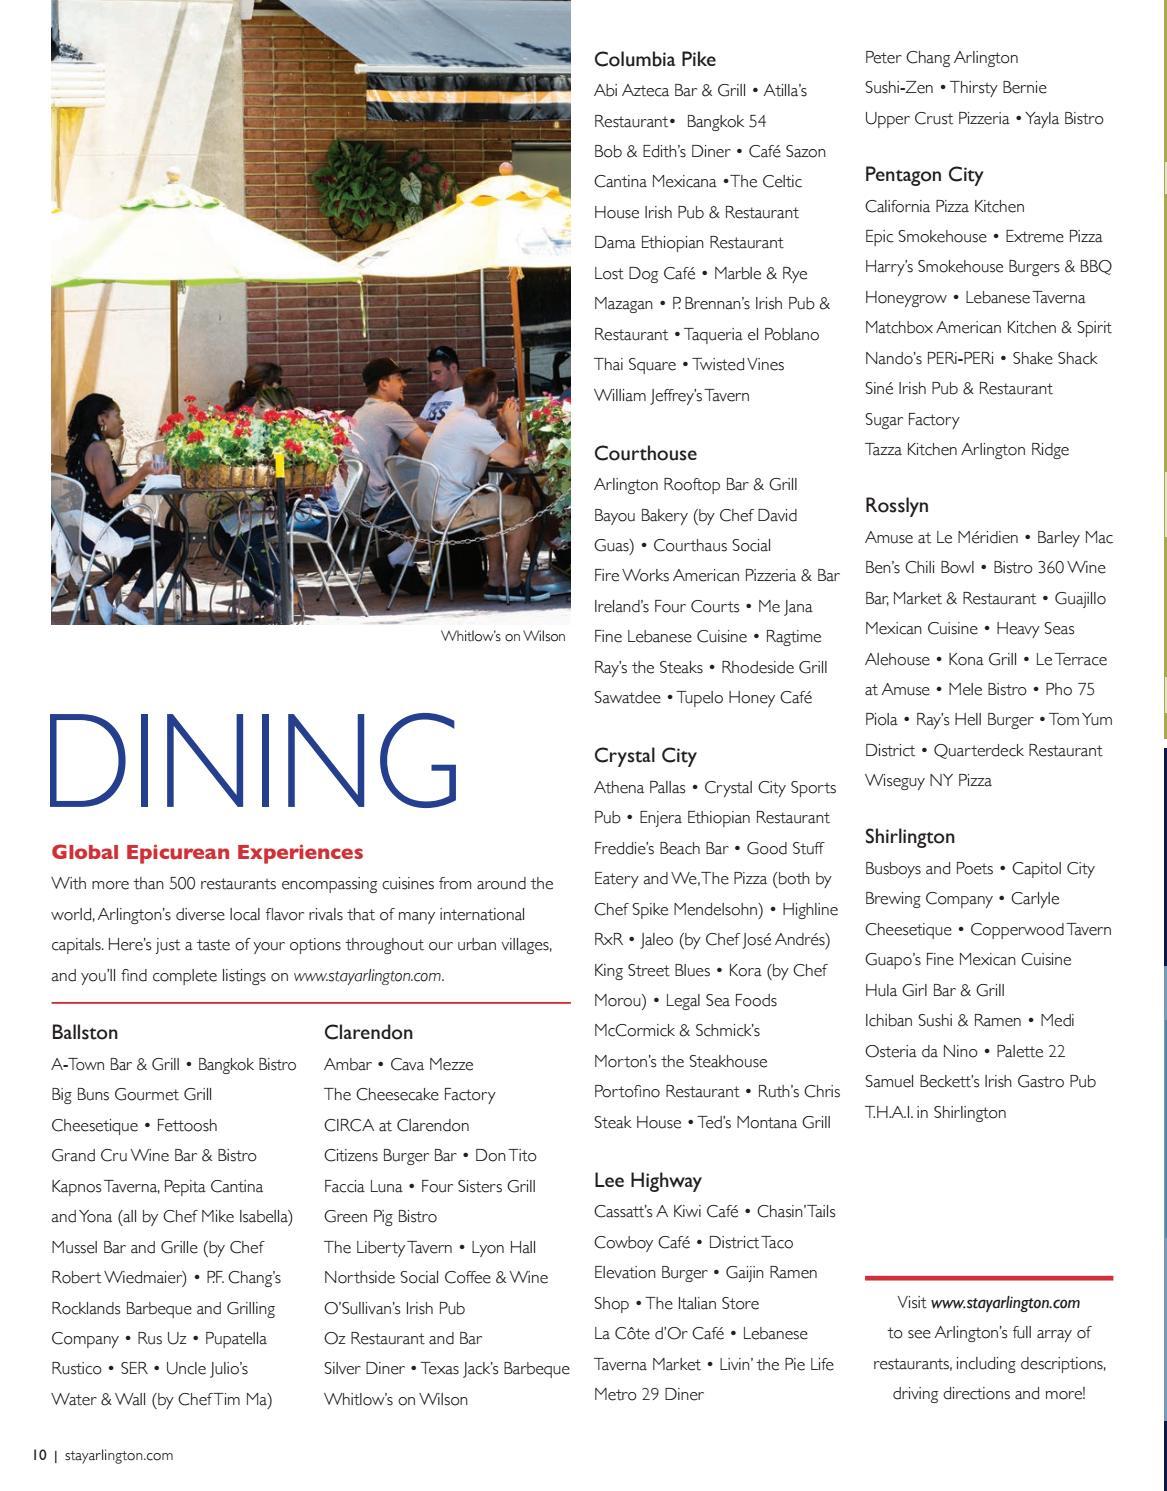 Arlington, Virginia Visitors Guide 2017-2018 by VistaGraphics - issuu